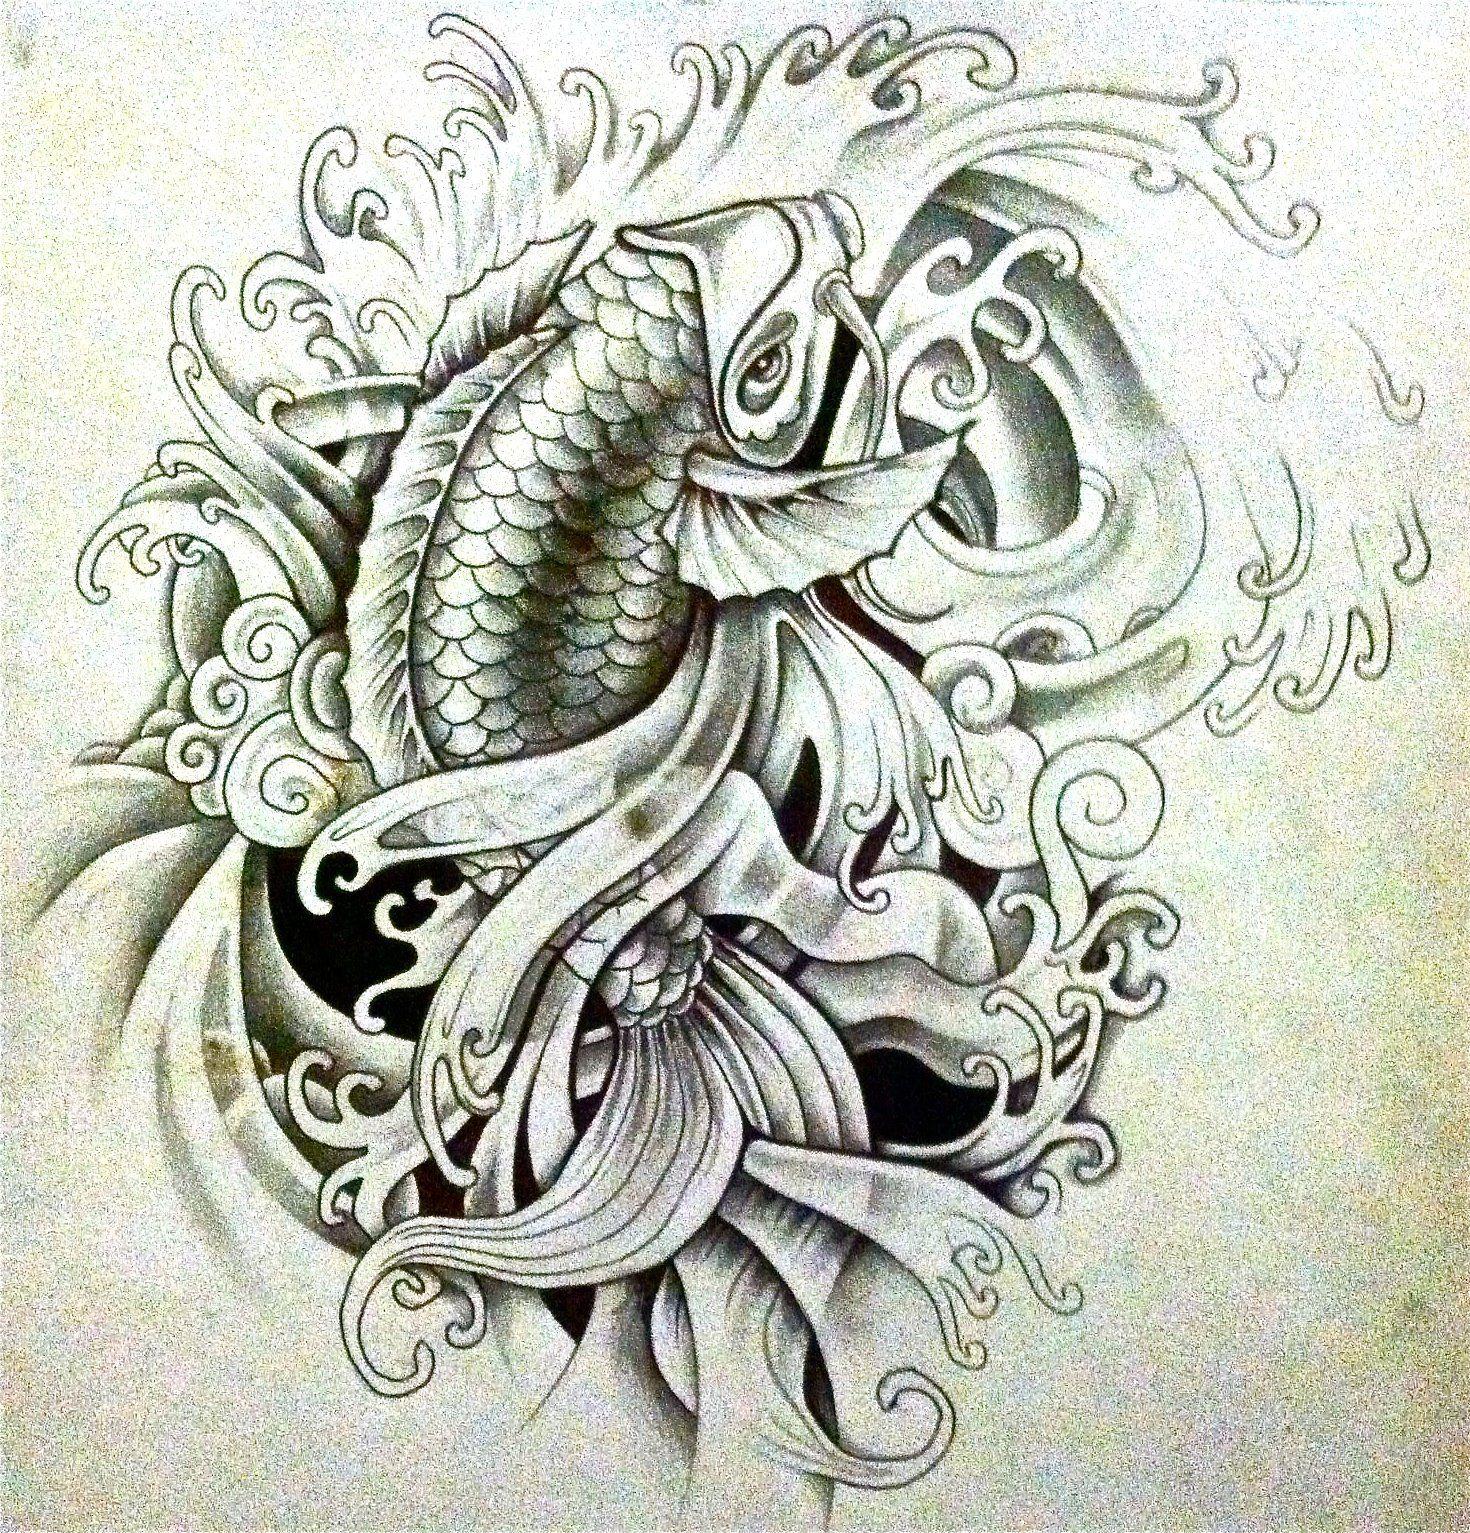 Tattoo Design By Ashley Lucian